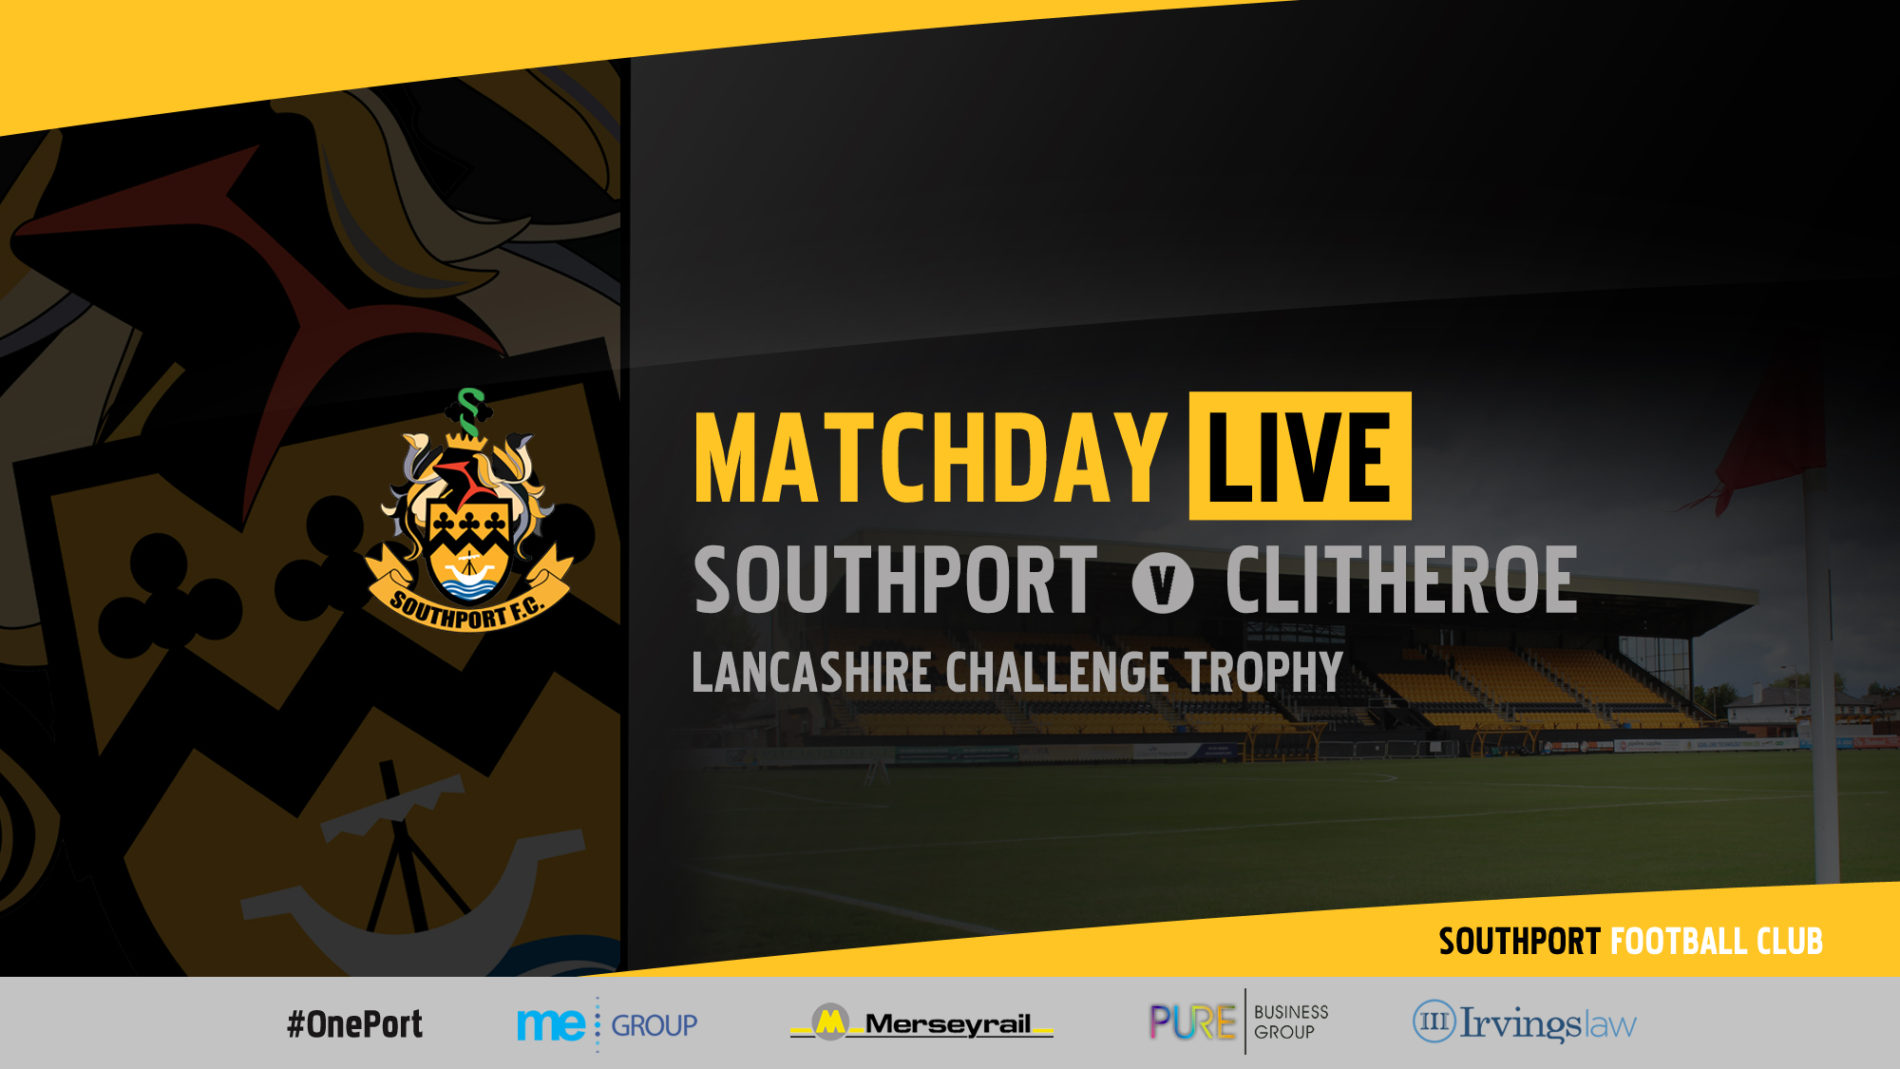 MATCHDAY LIVE   Southport v Clitheroe – Lancs Challenge Trophy